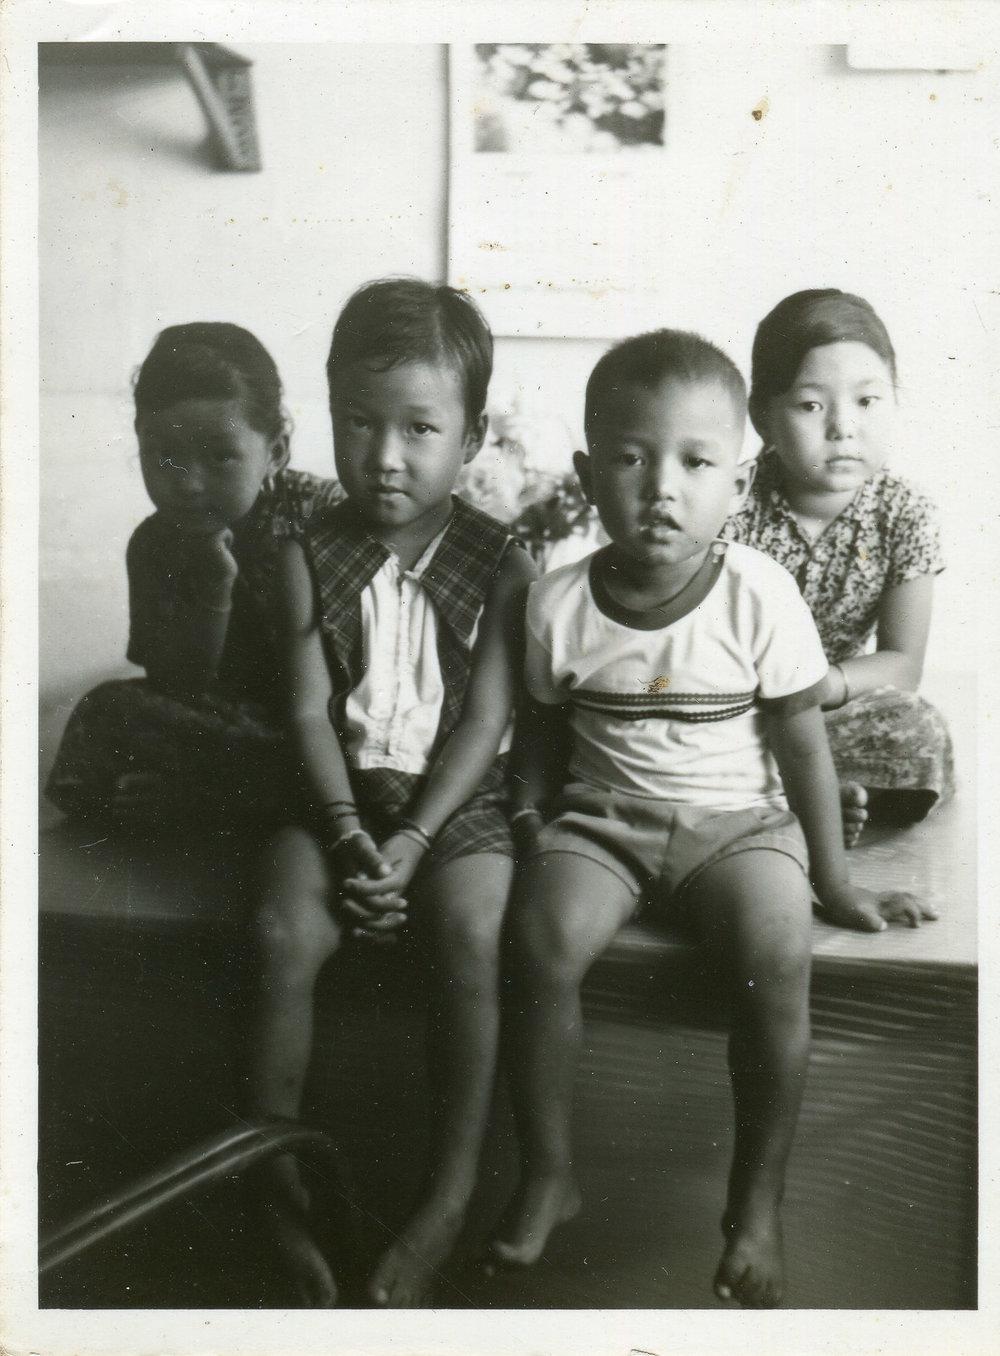 singapore-gurkhas-archive-photo-museum-zakaria-zainal-6.jpg